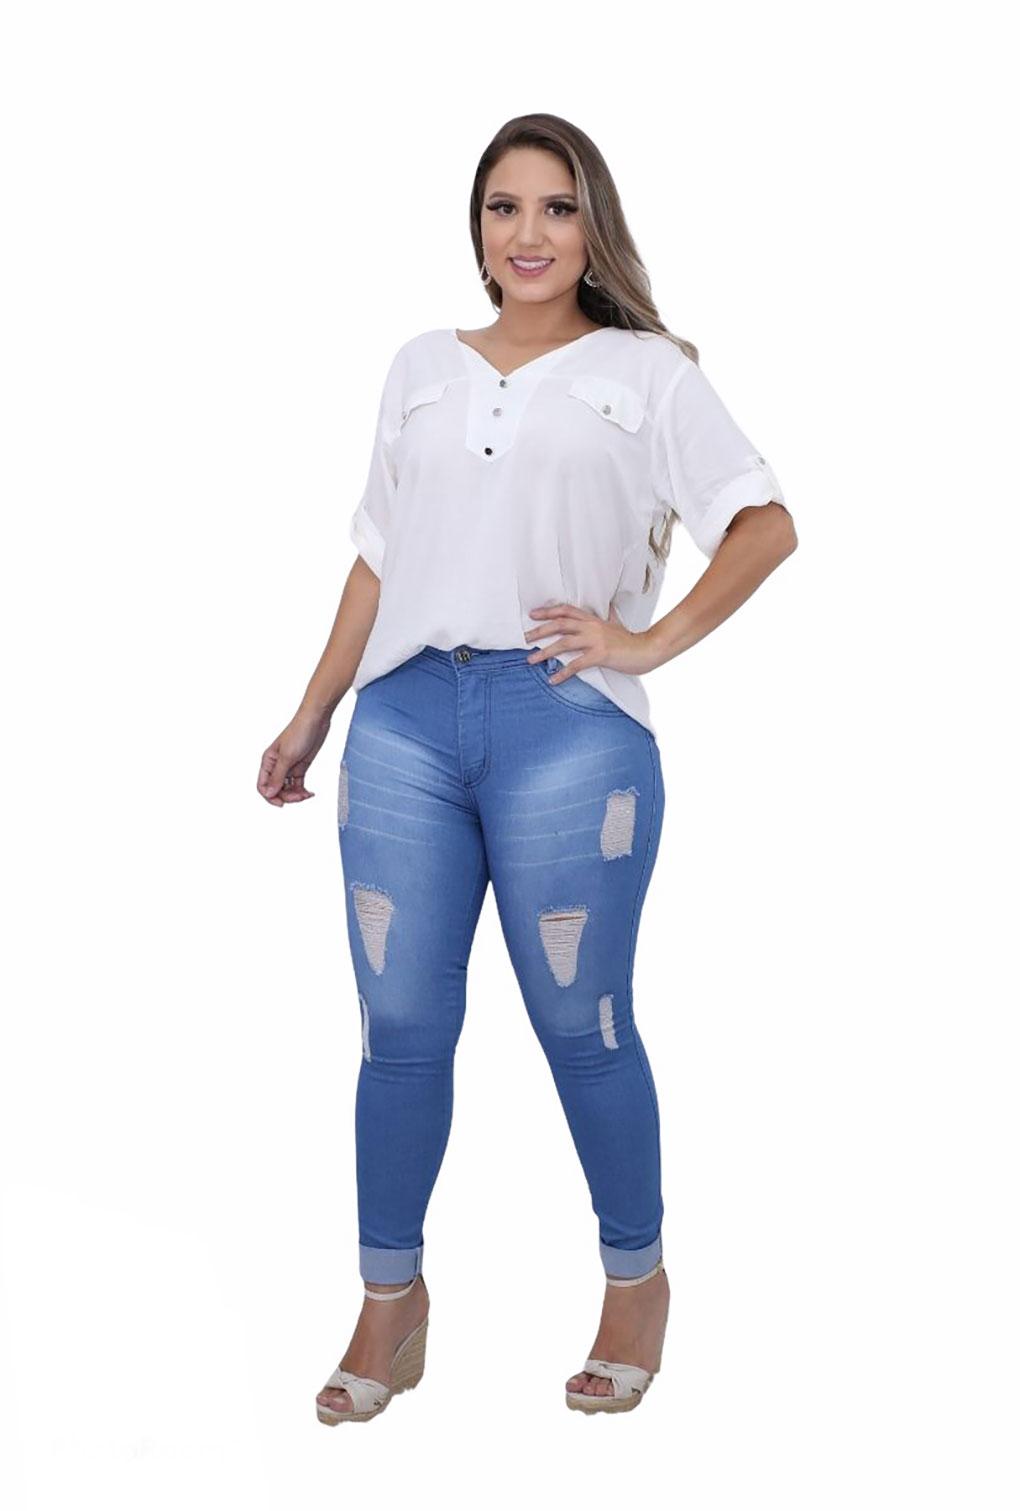 Camisa Blusa Feminina Manga Curta Social Sport Branca  - ModaStore   Moda Feminina